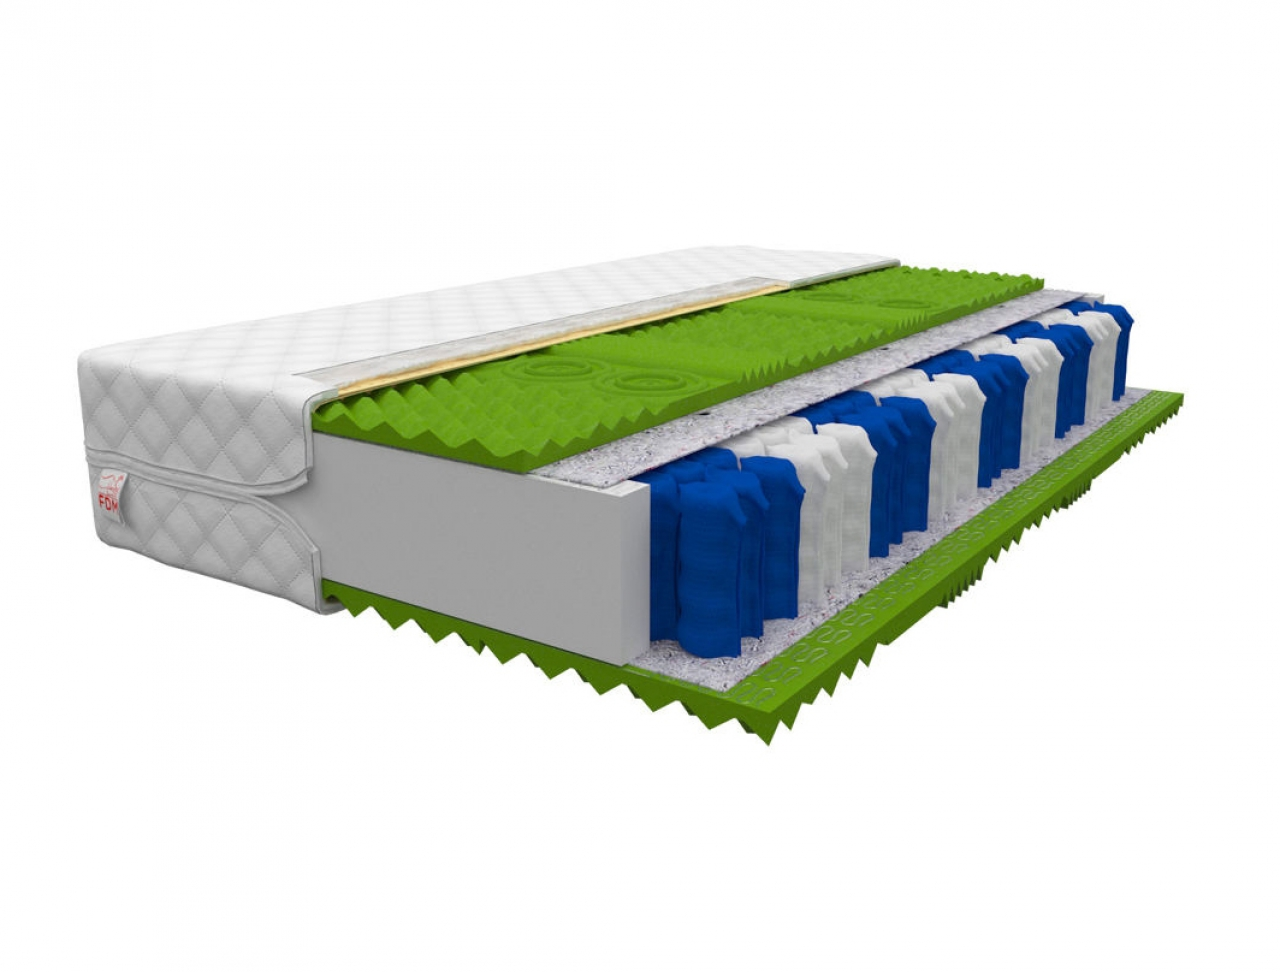 Costa Max táskarugós matrac